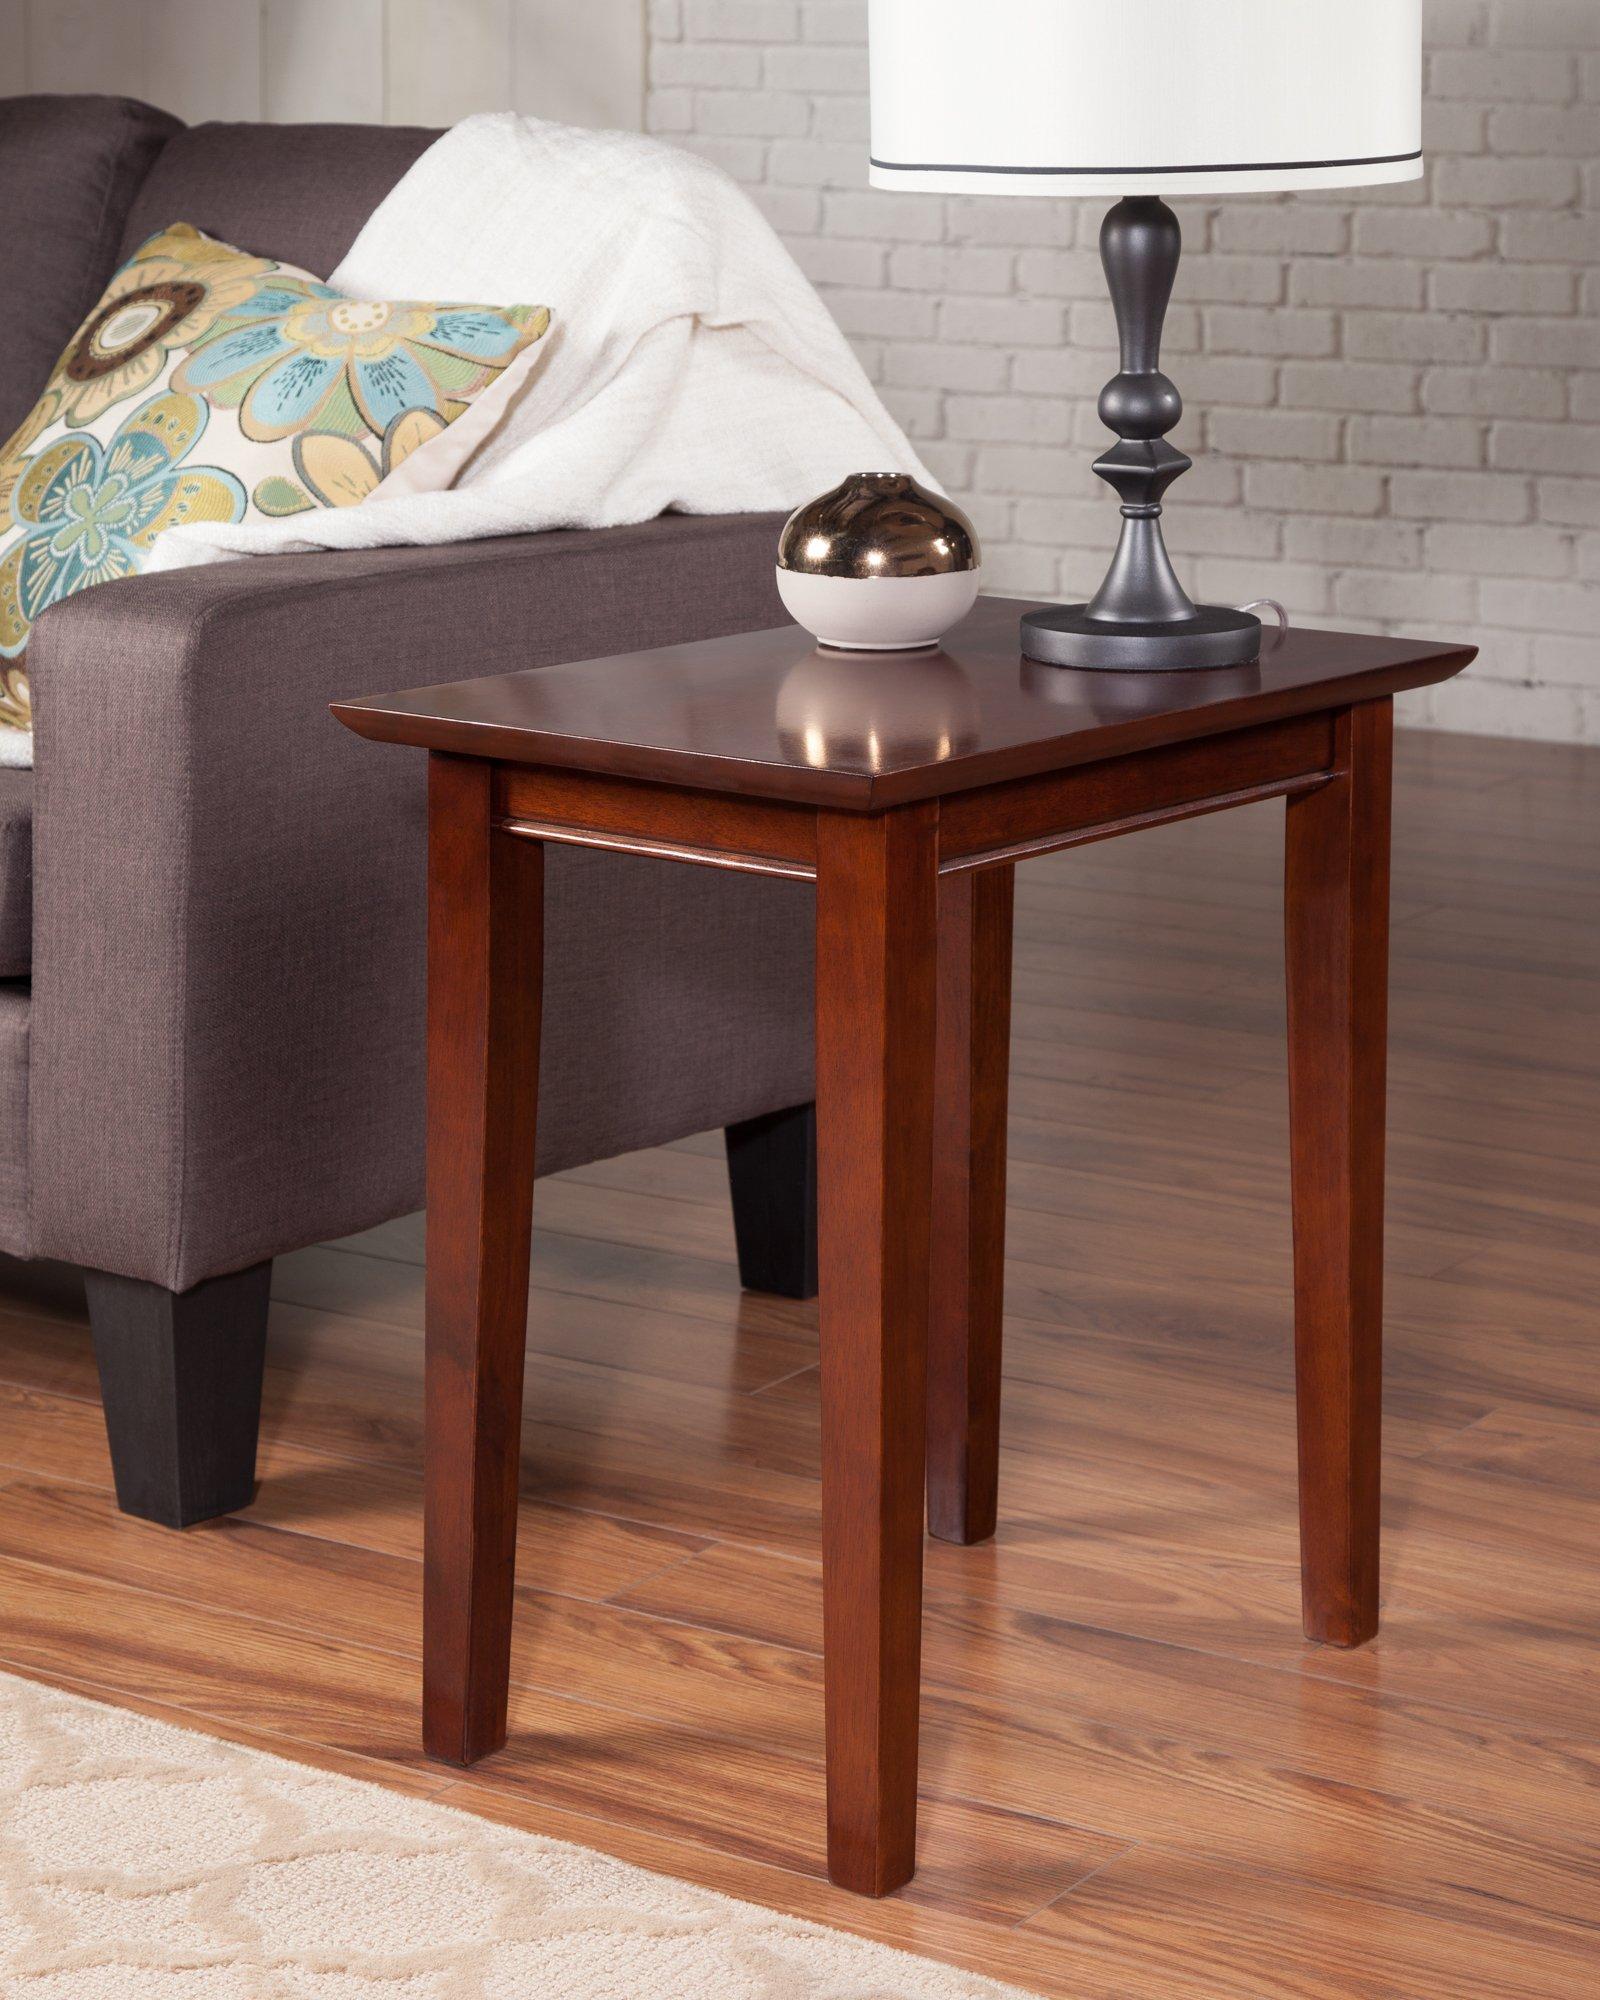 Atlantic Furniture AH13104 Shaker Side Table Rubber Wood, Walnut